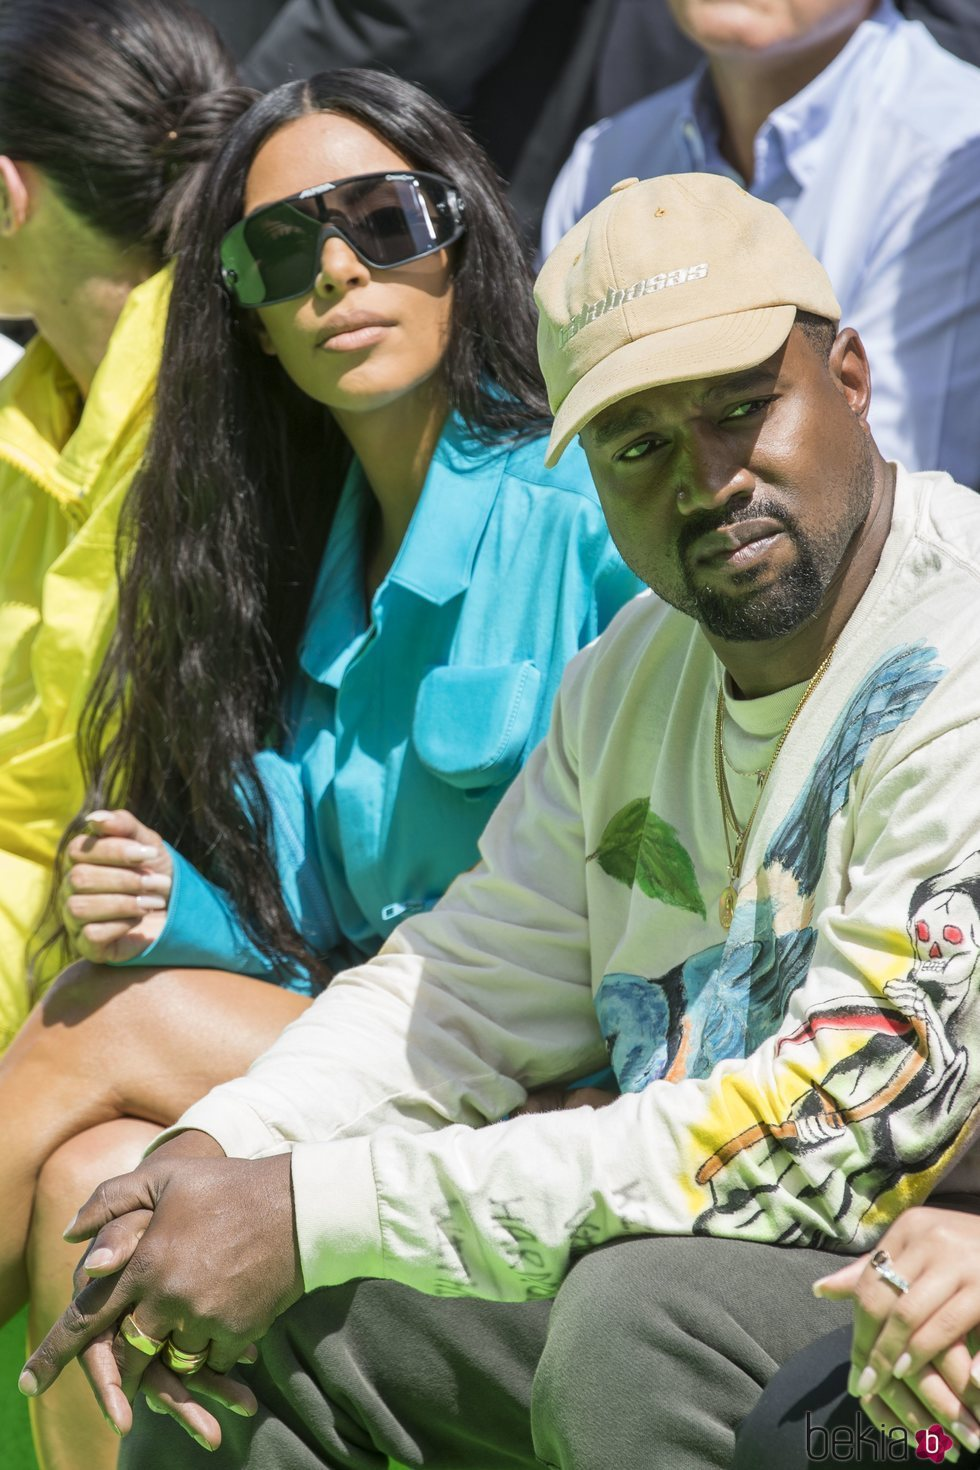 Kim Kardashian y Kanye West en el desfile de Virgil Abloh en París